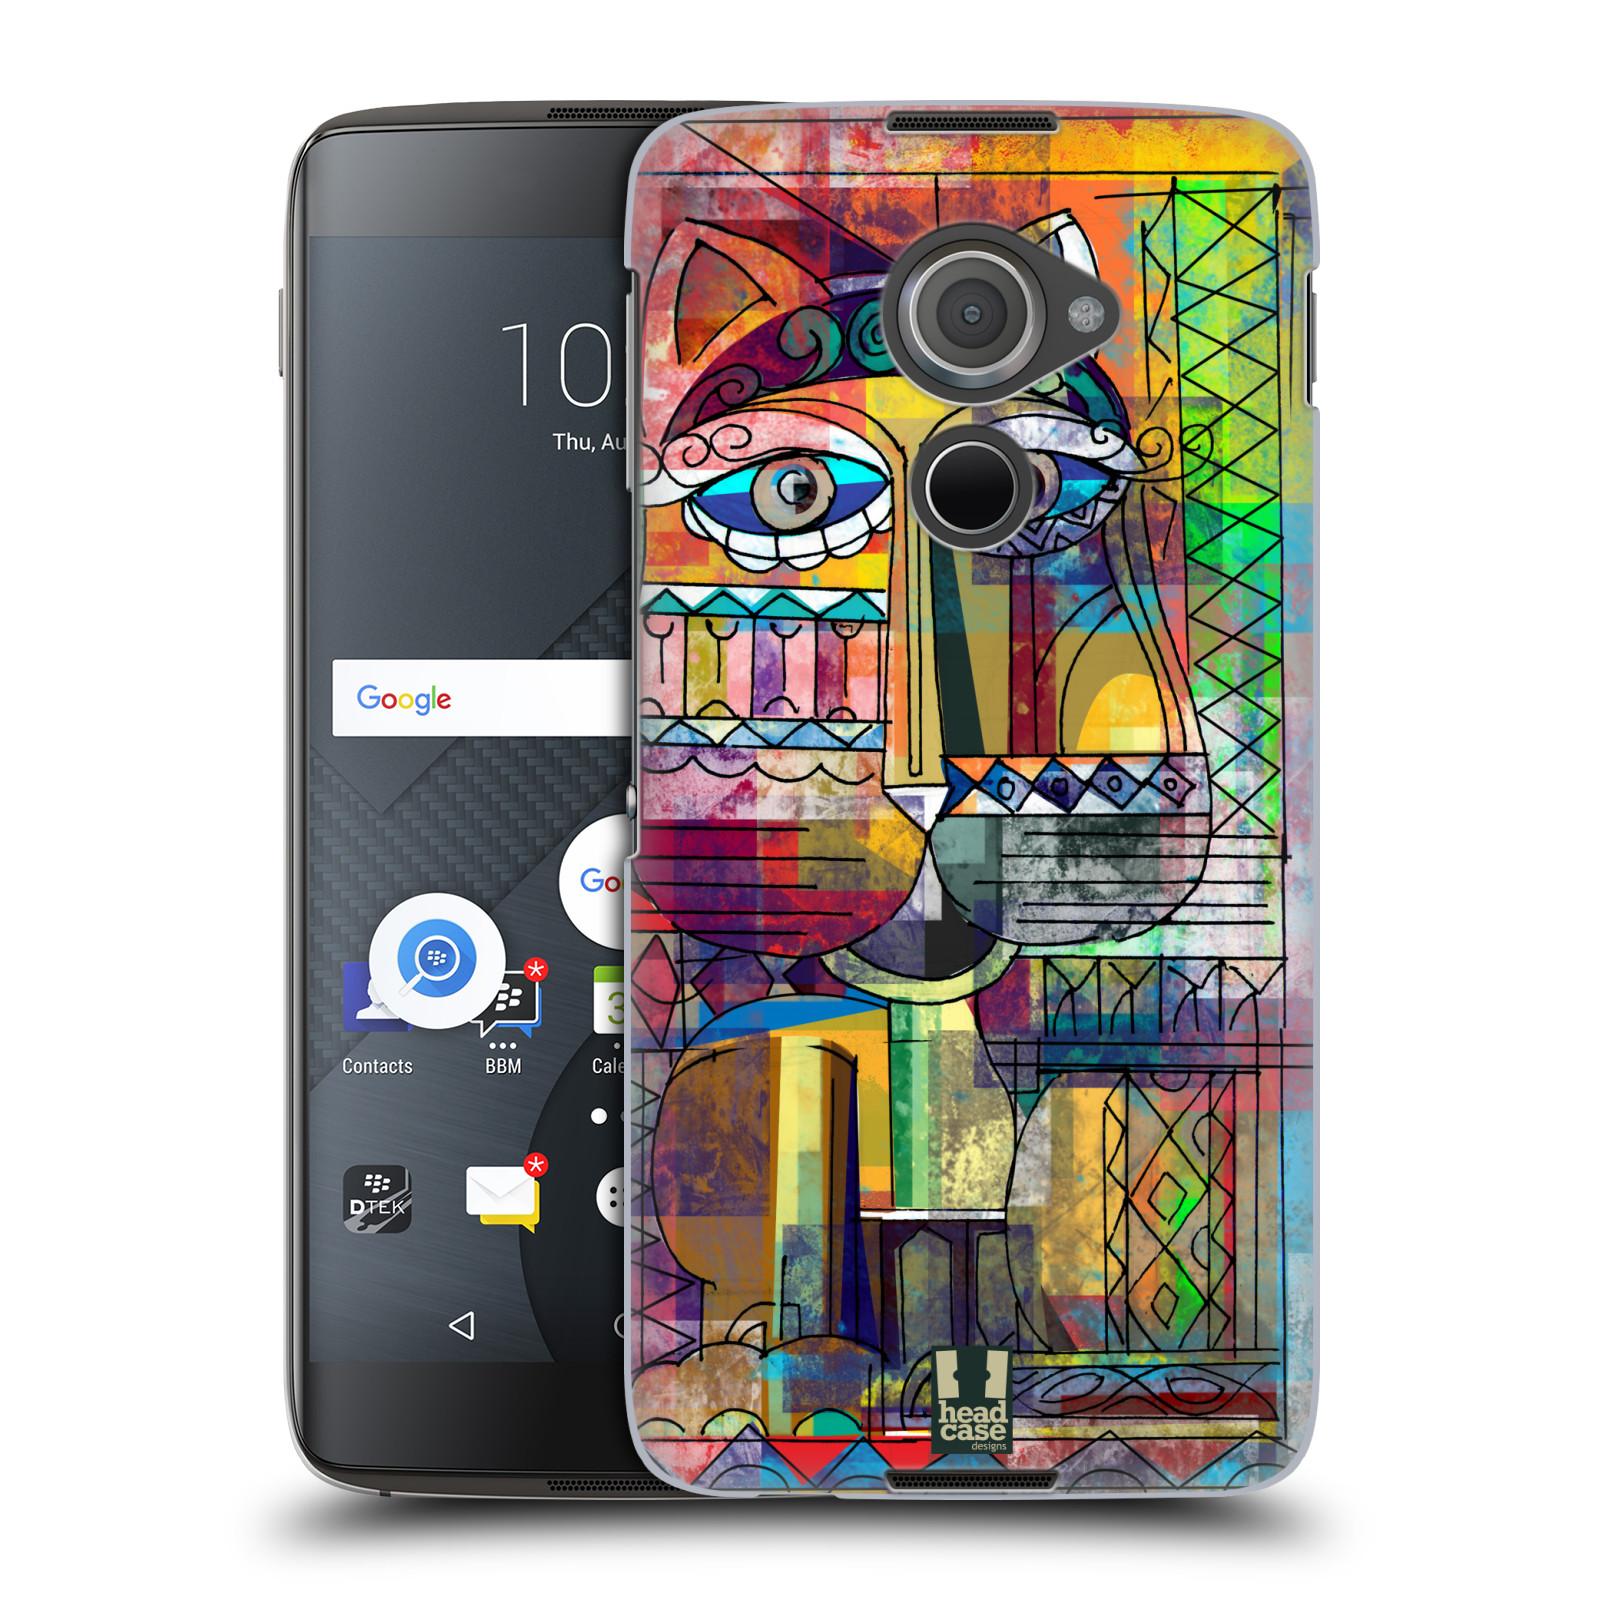 Plastové pouzdro na mobil Blackberry DTEK60 (Argon) - Head Case AZTEC KORAT